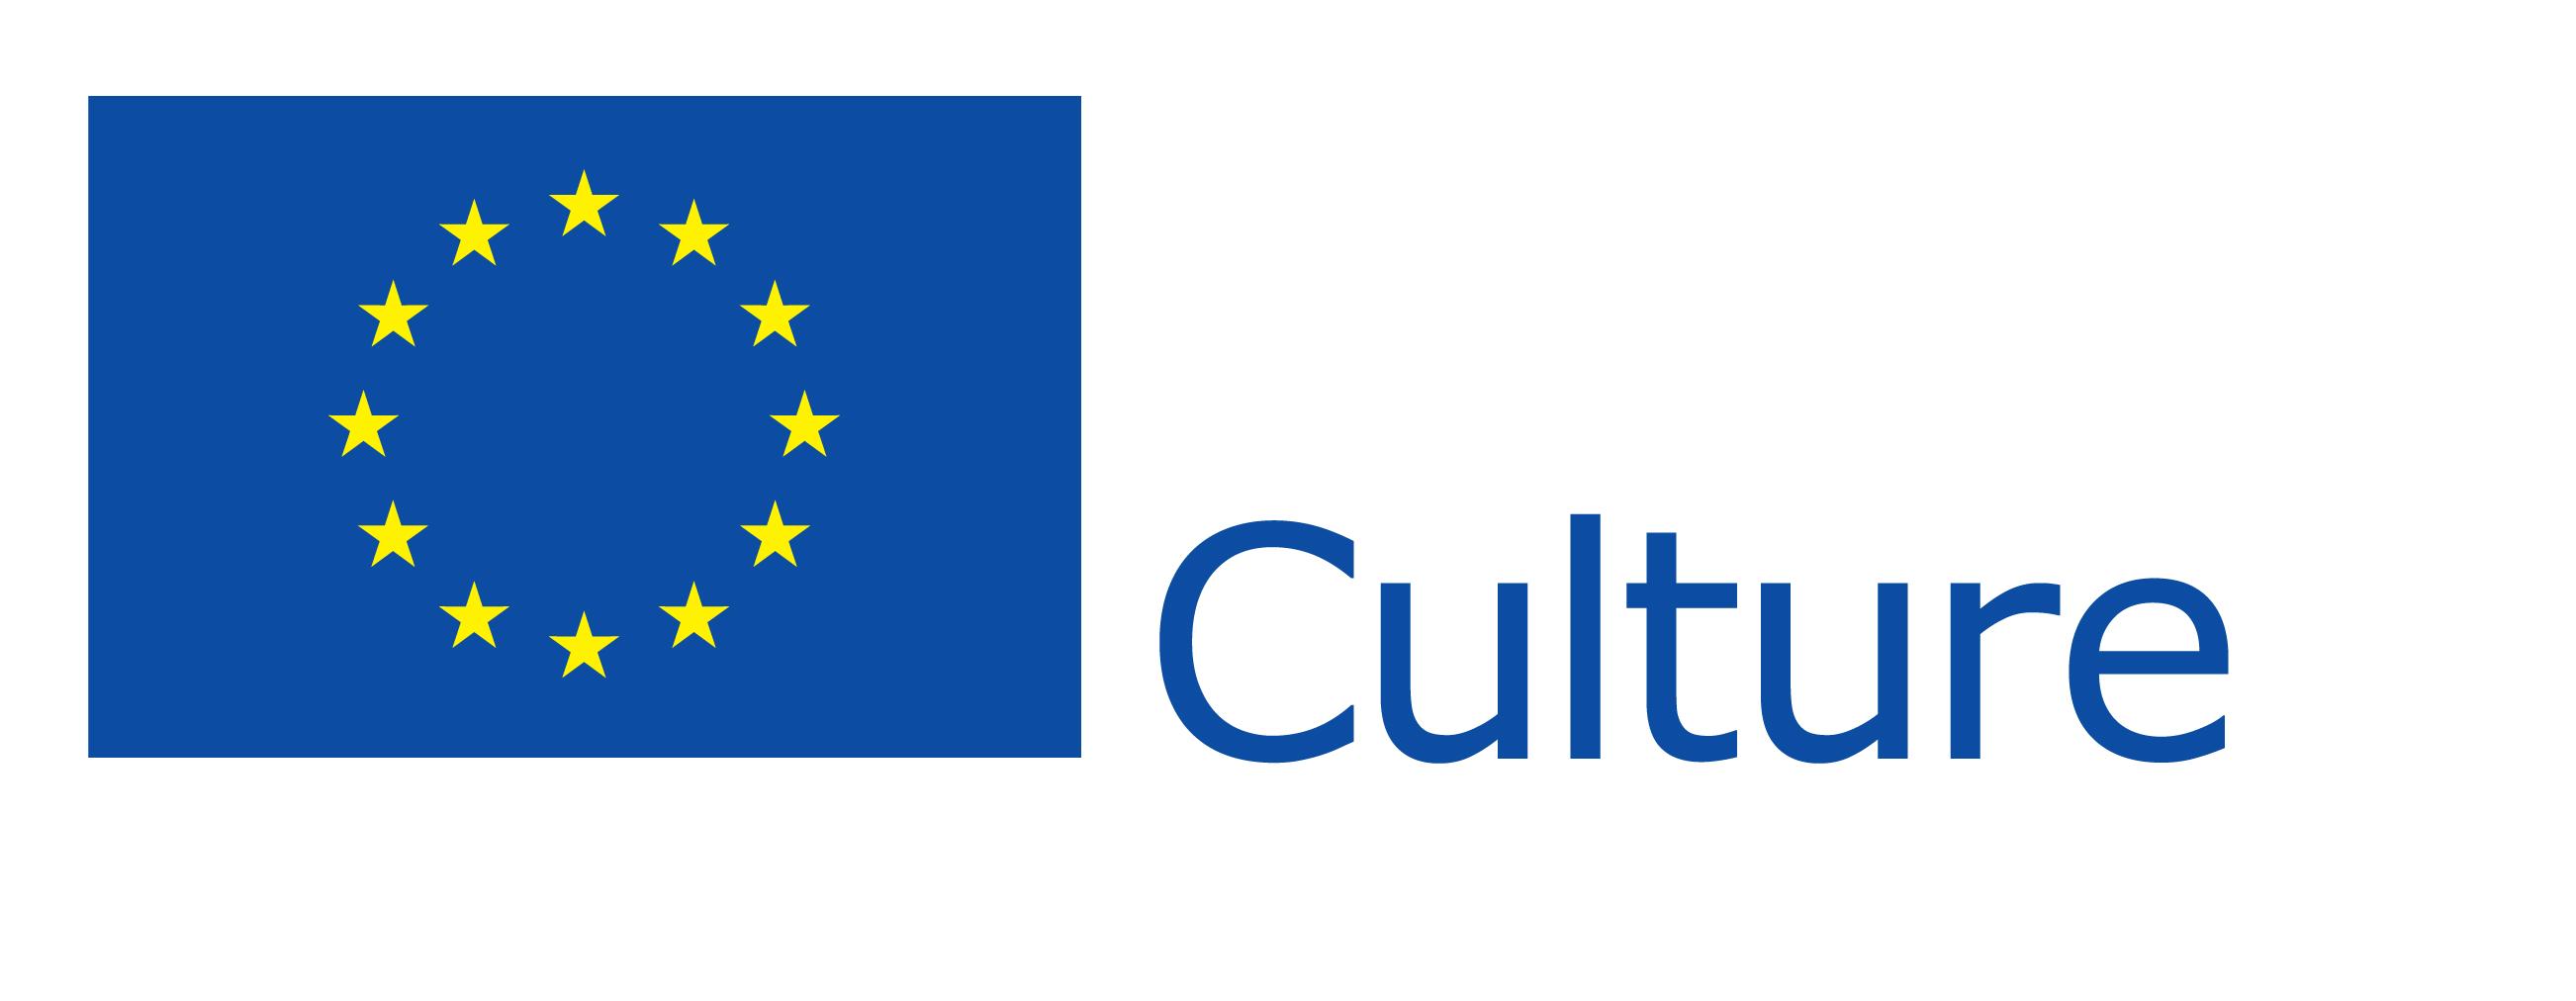 Culture Programme of The European Union